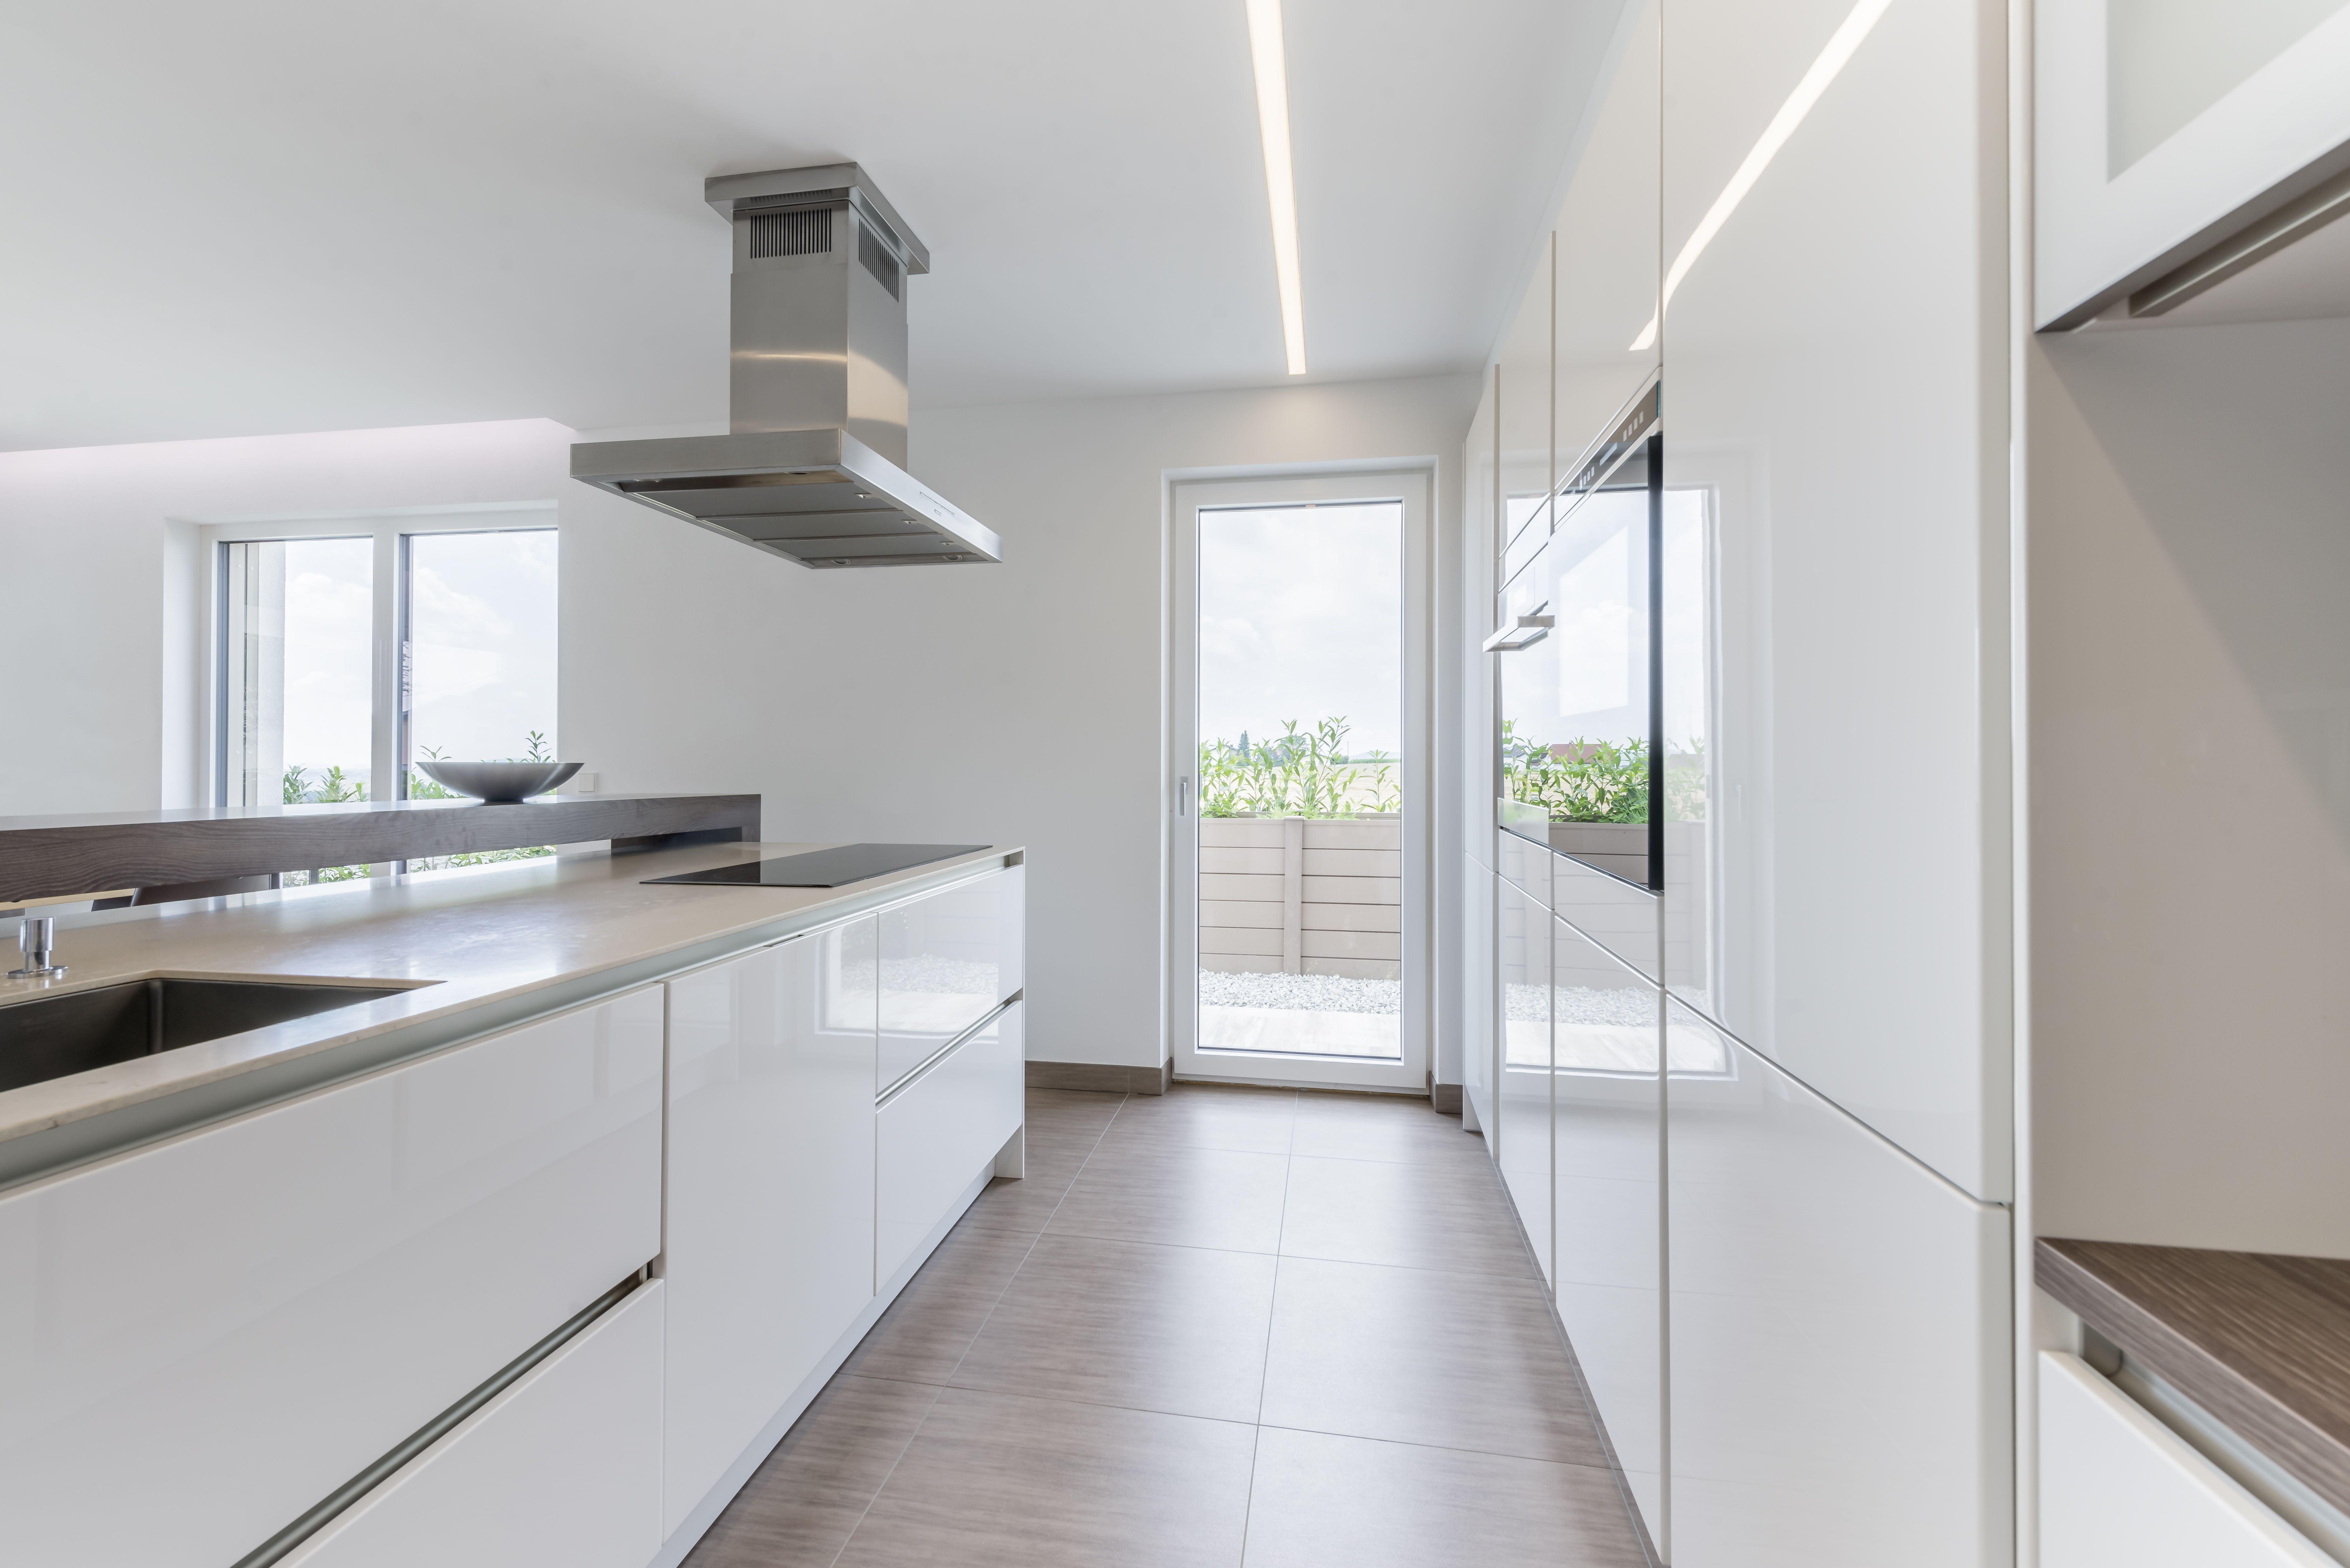 minimalistic interior design kitchen interiors dream windows and doors interior on kitchen interior with window id=11400